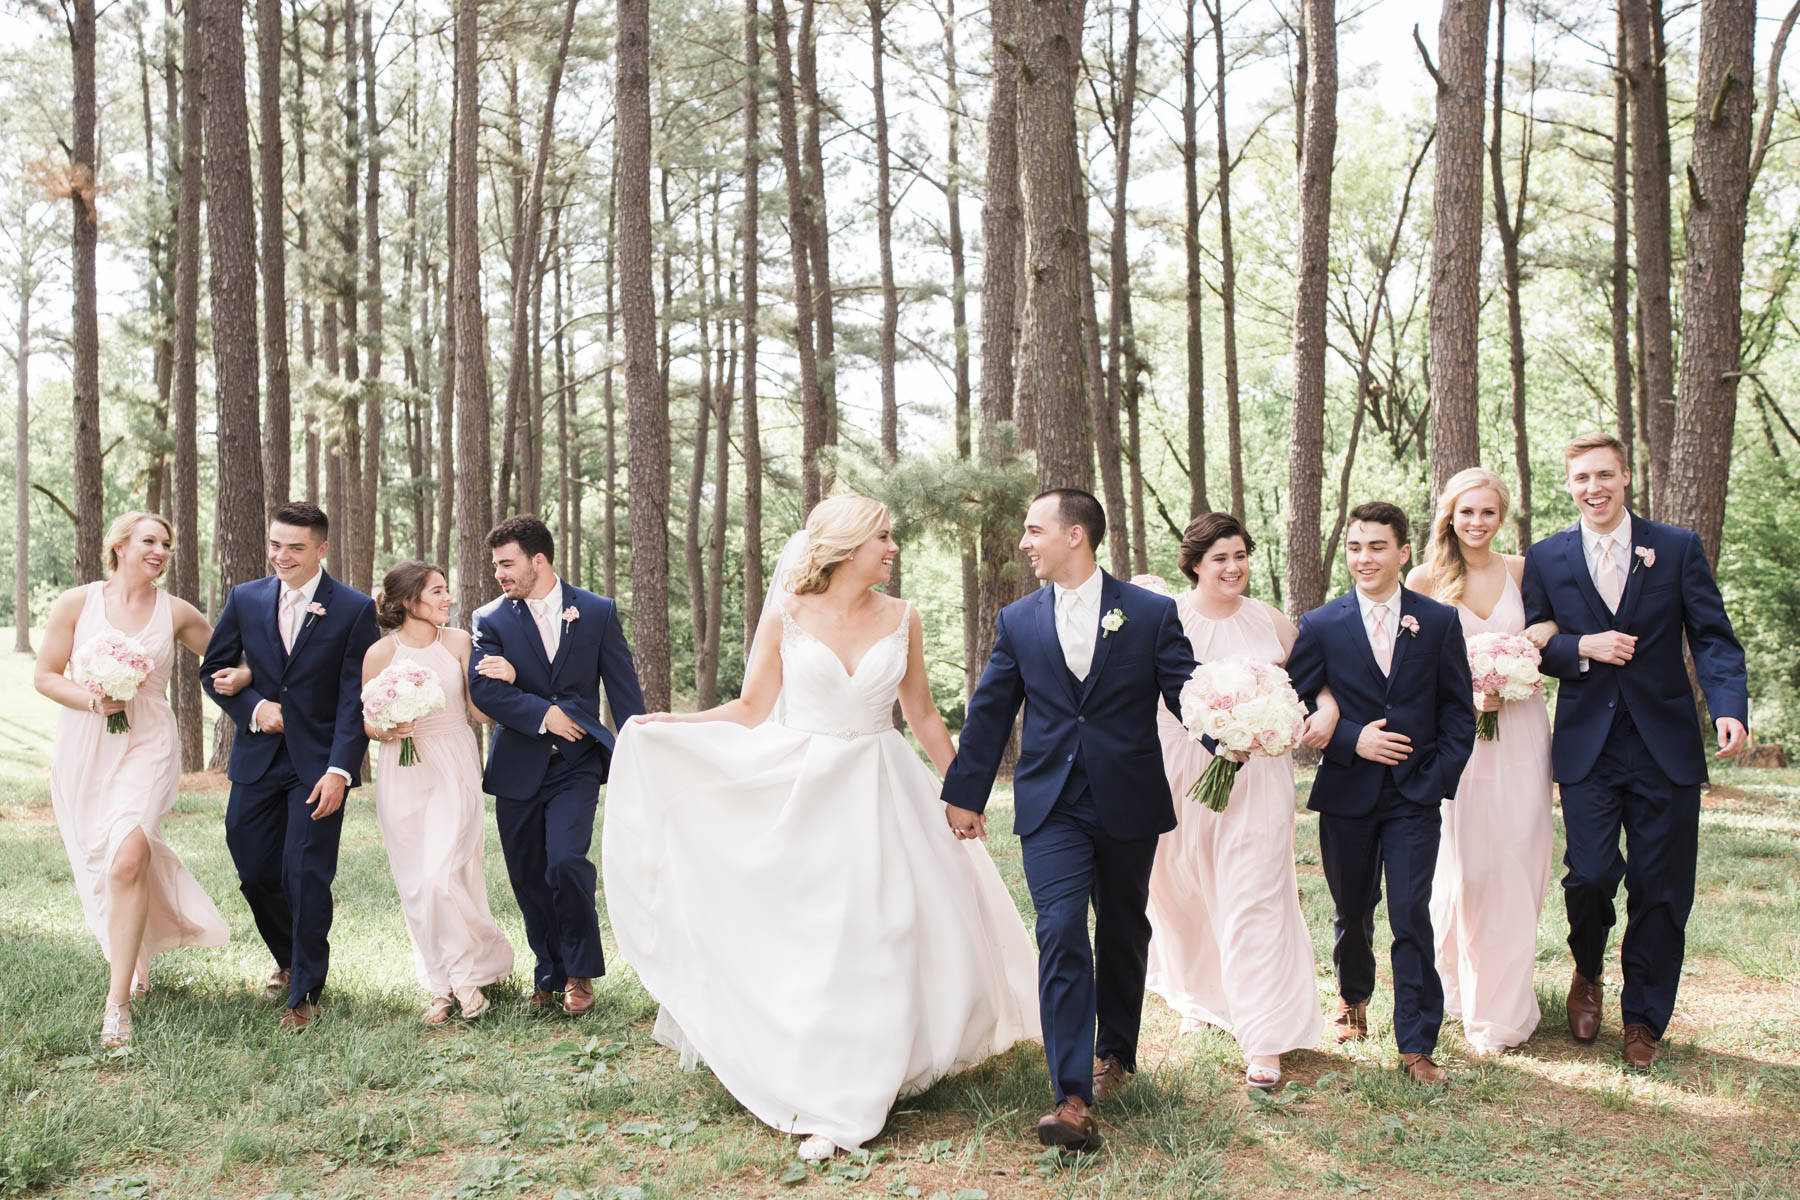 shotbychelsea_wedding_photography_blog-5.jpg